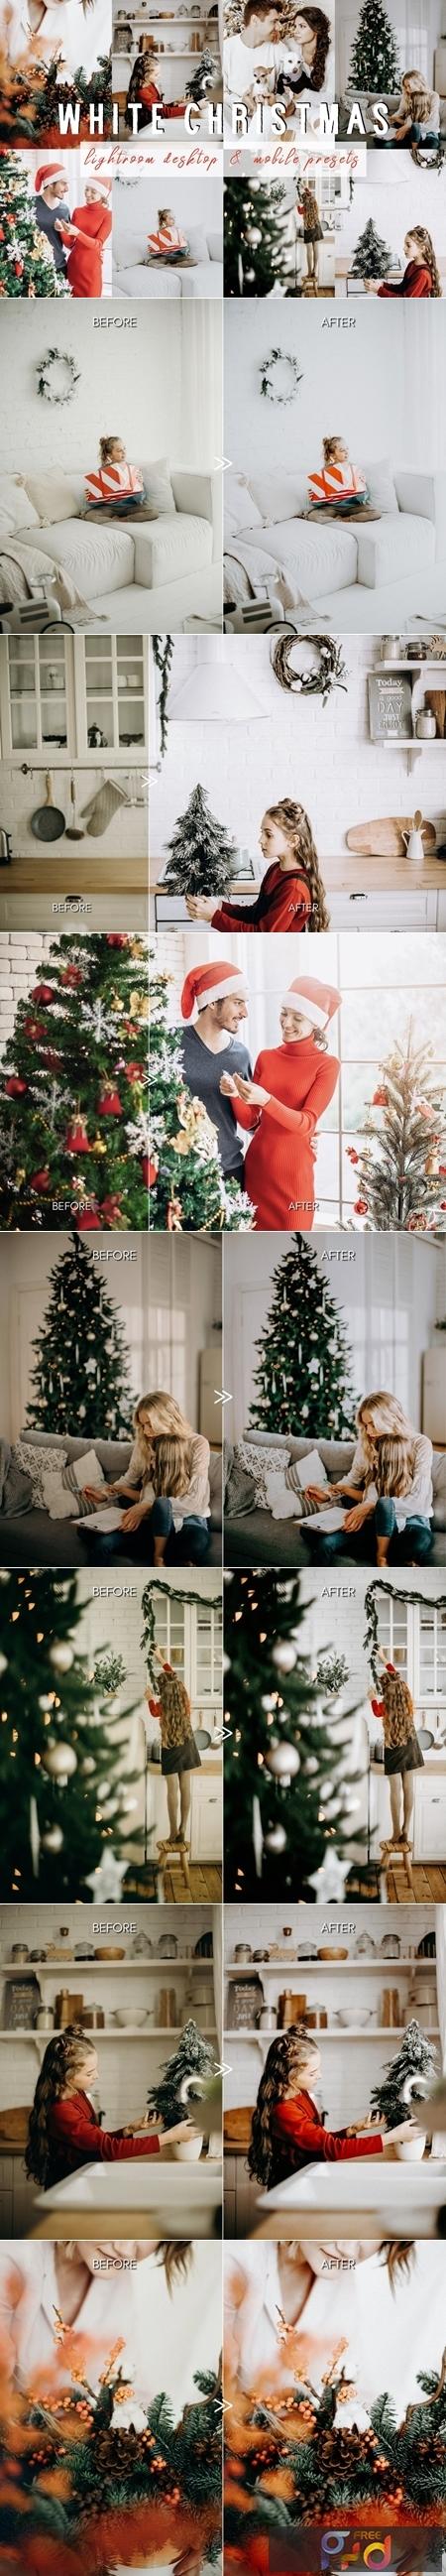 WHITE CHRISTMAS Lightroom Presets 4418467 1